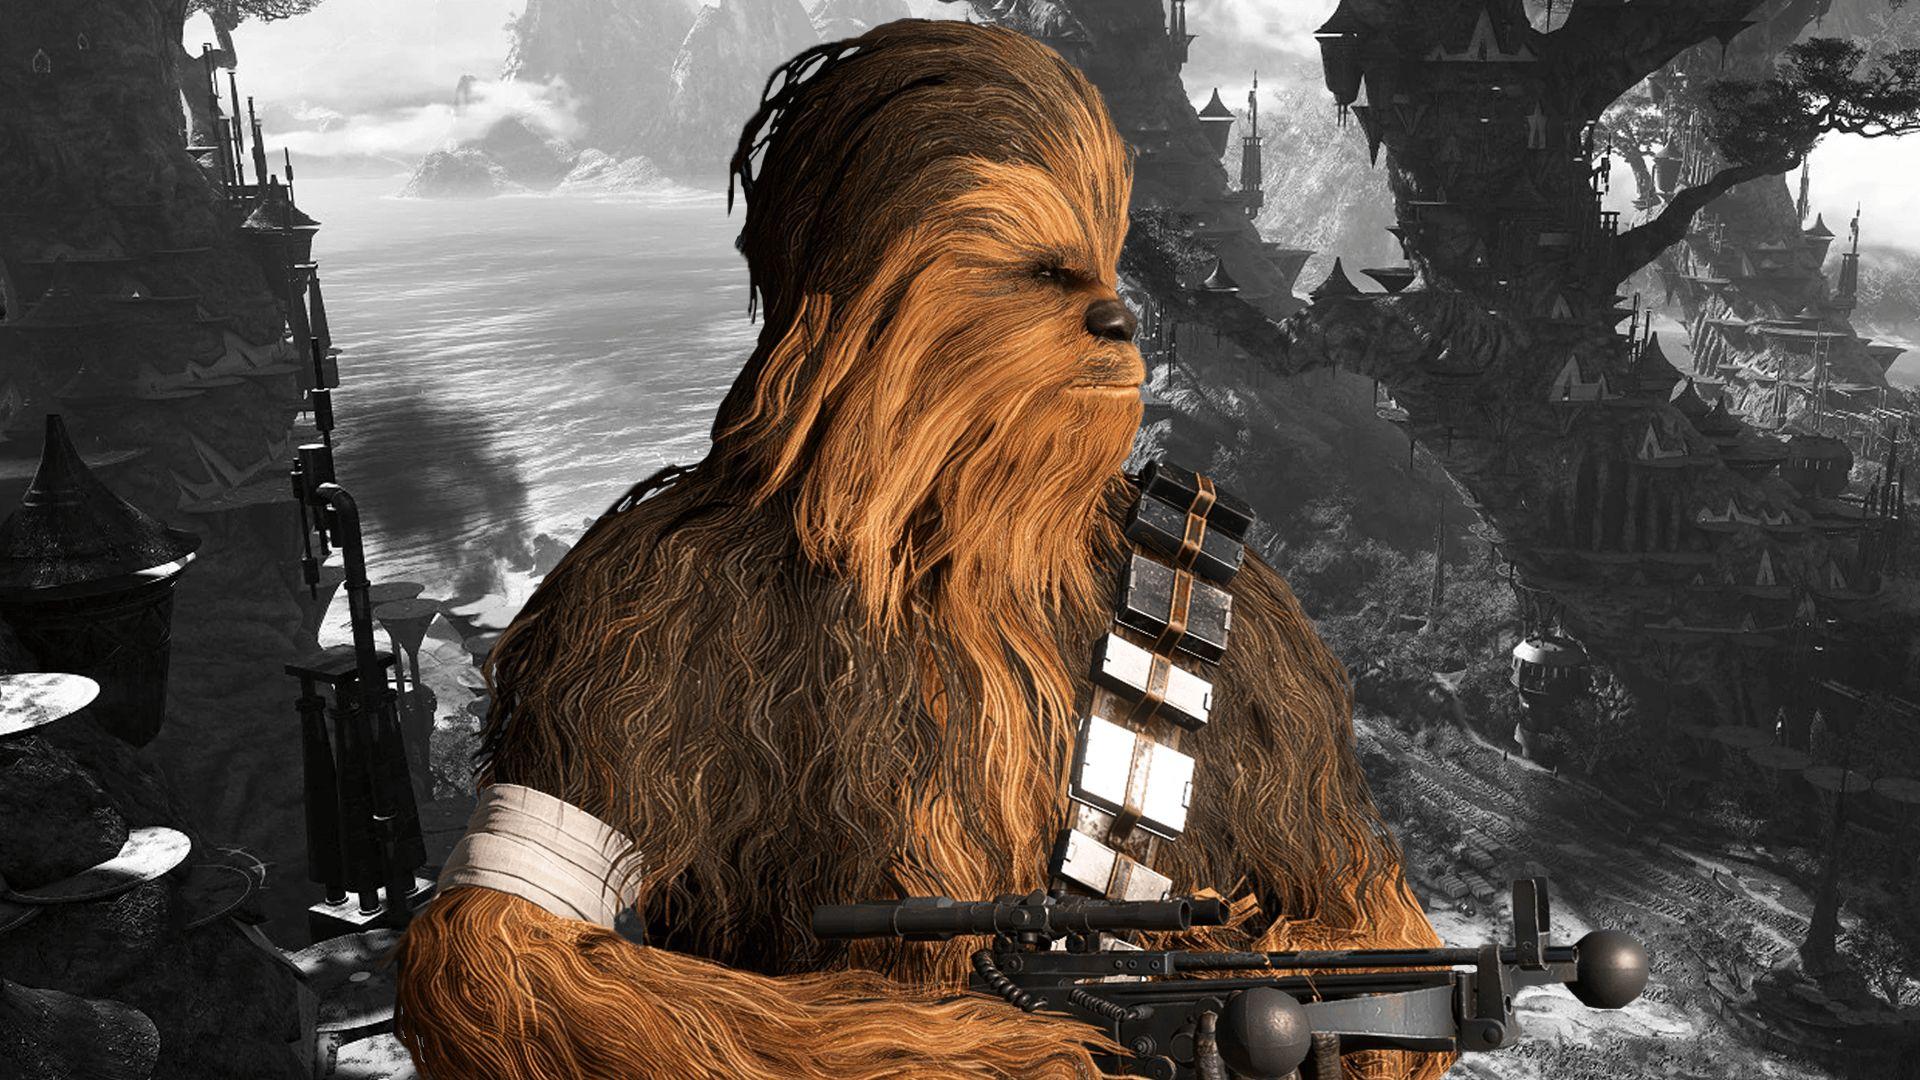 Chewbacca wallpaper hd